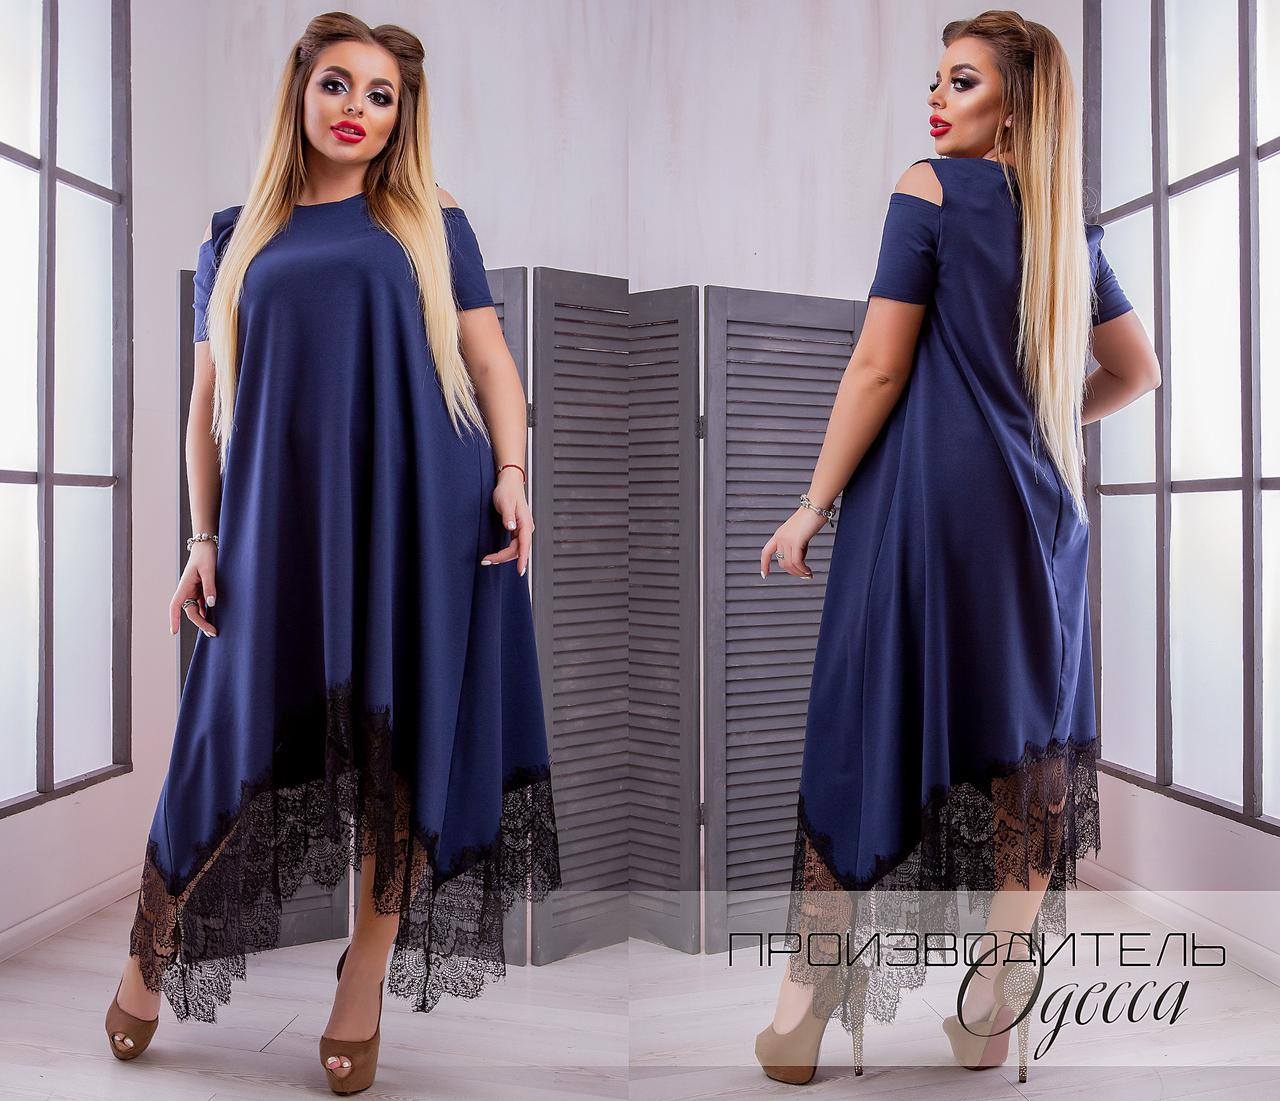 7c1145ef023 Красивое женское платье с кружевом асимметрия батал - Интернет-магазин